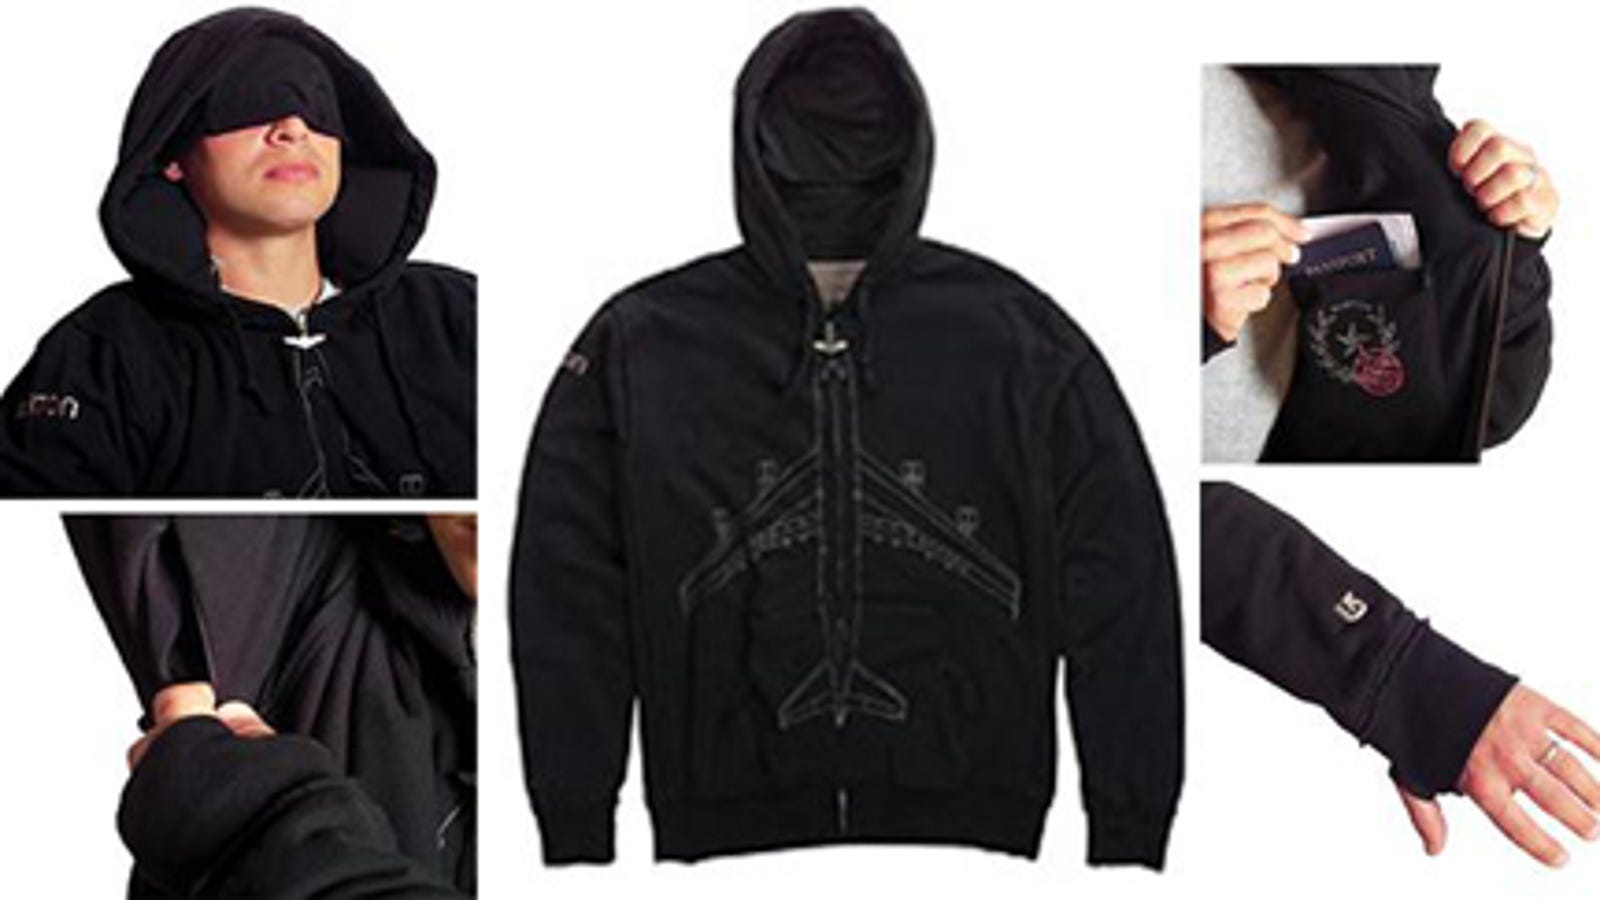 hoodie sleeper s vimeo vimeocdn burton icon review overlay com on